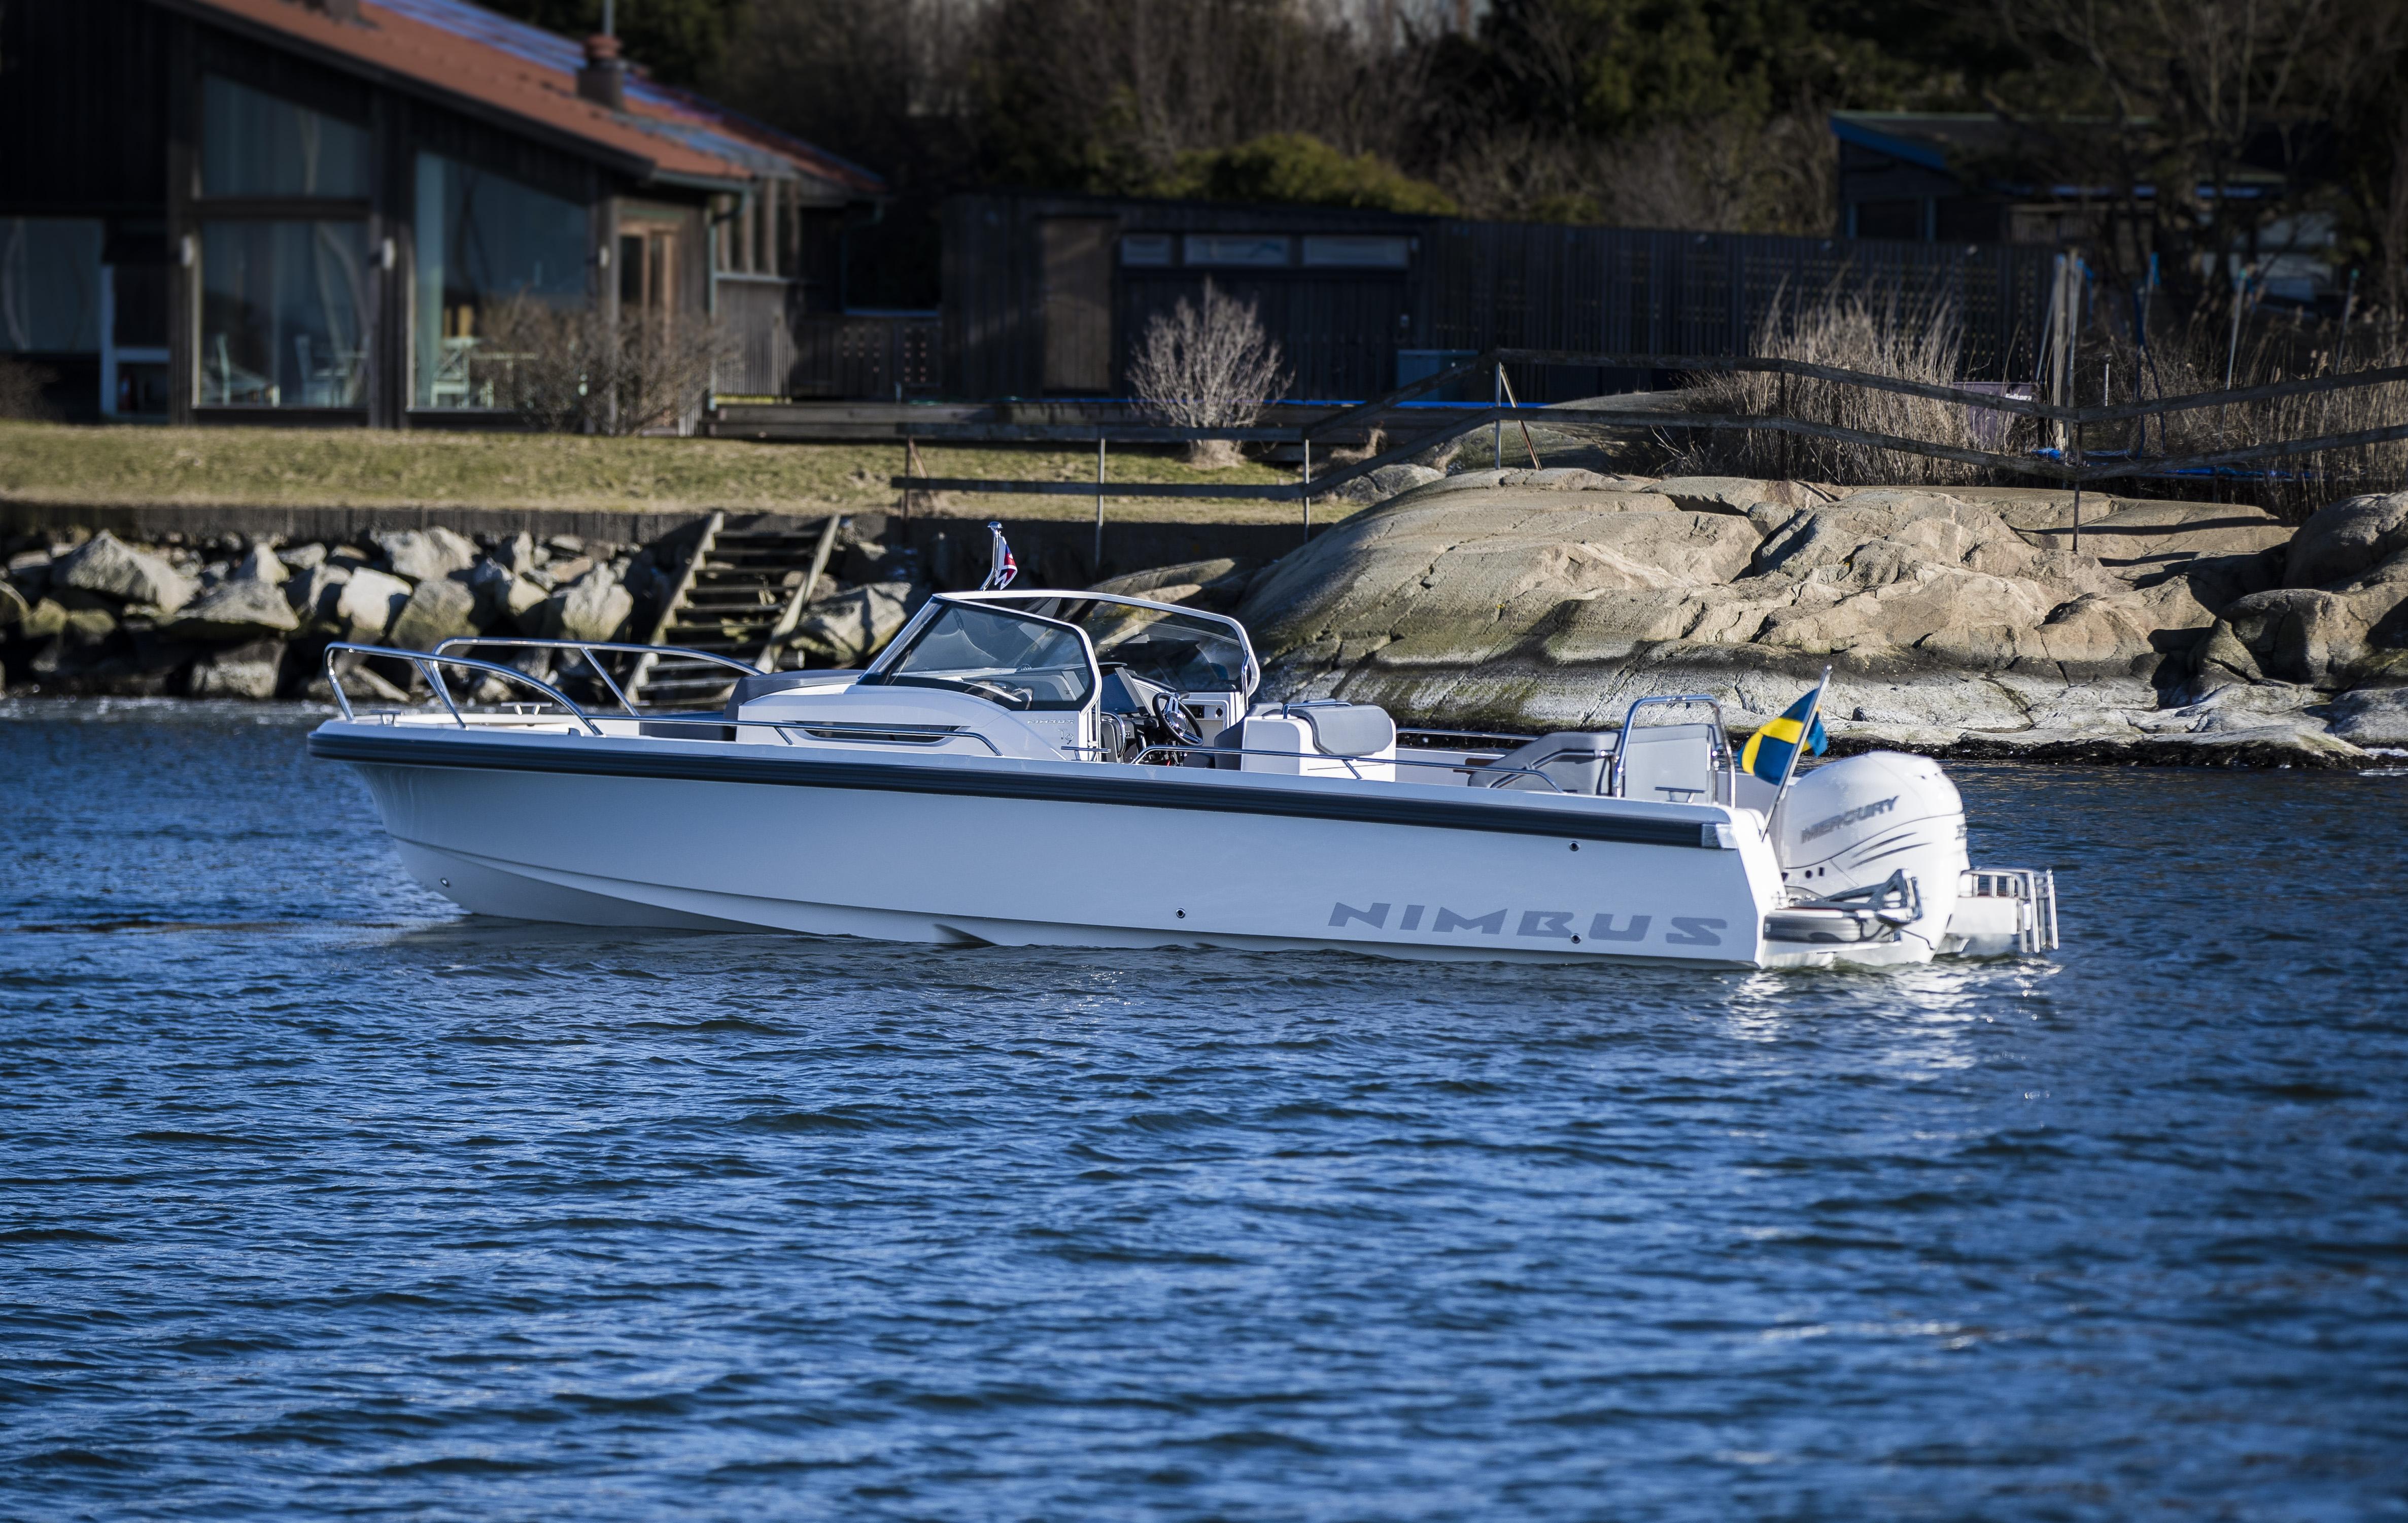 Nimbus boat resting in the water